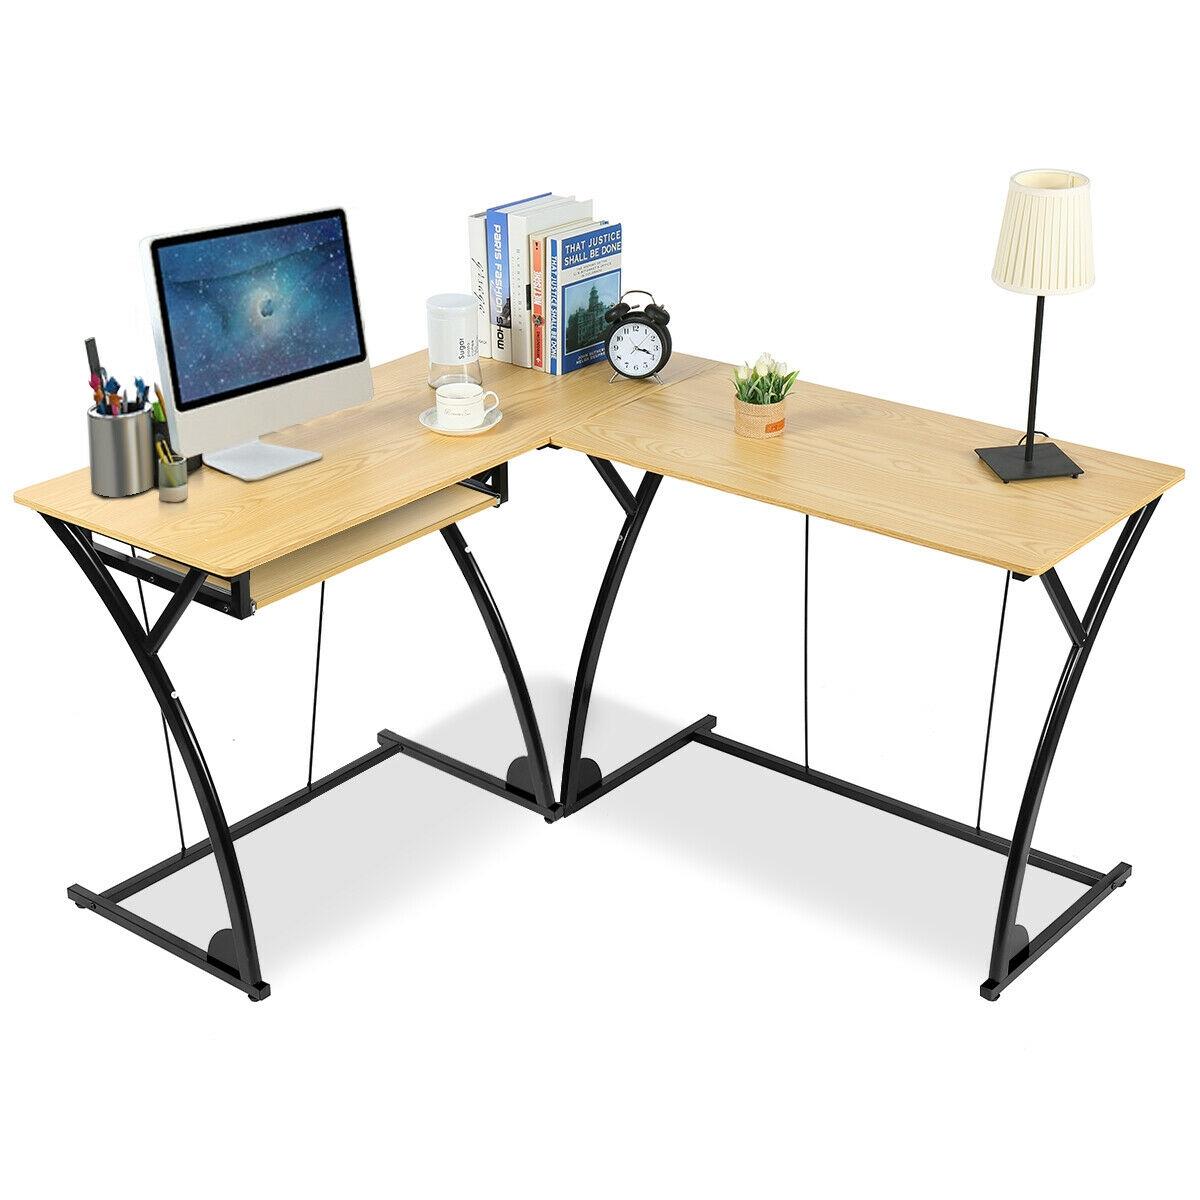 L-Shaped Home Office Corner Desk Computer PC Laptop Table